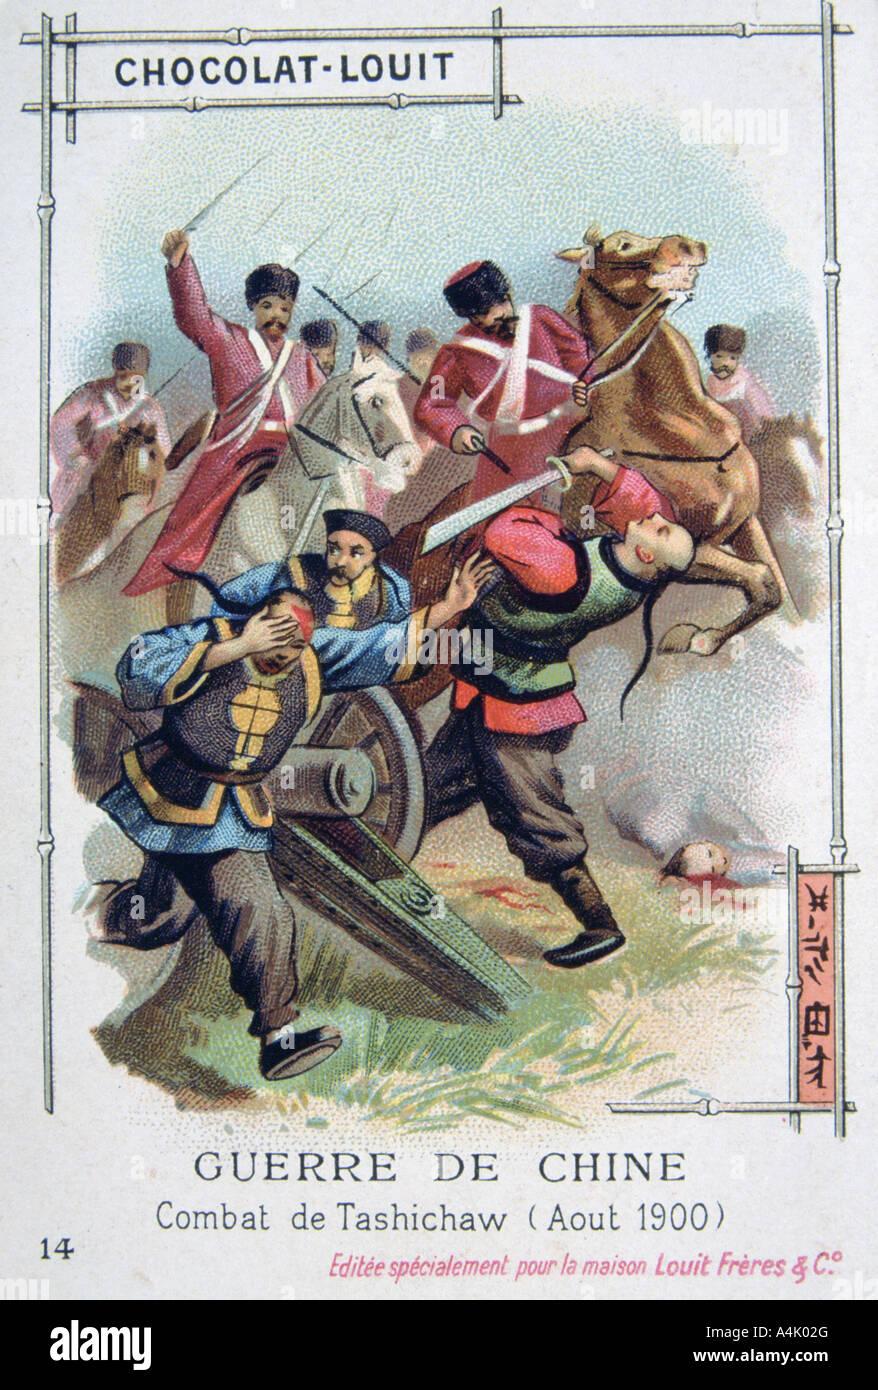 Battle at Tashichaw, China, Boxer Rebellion, August 1900. Artist: Unknown - Stock Image